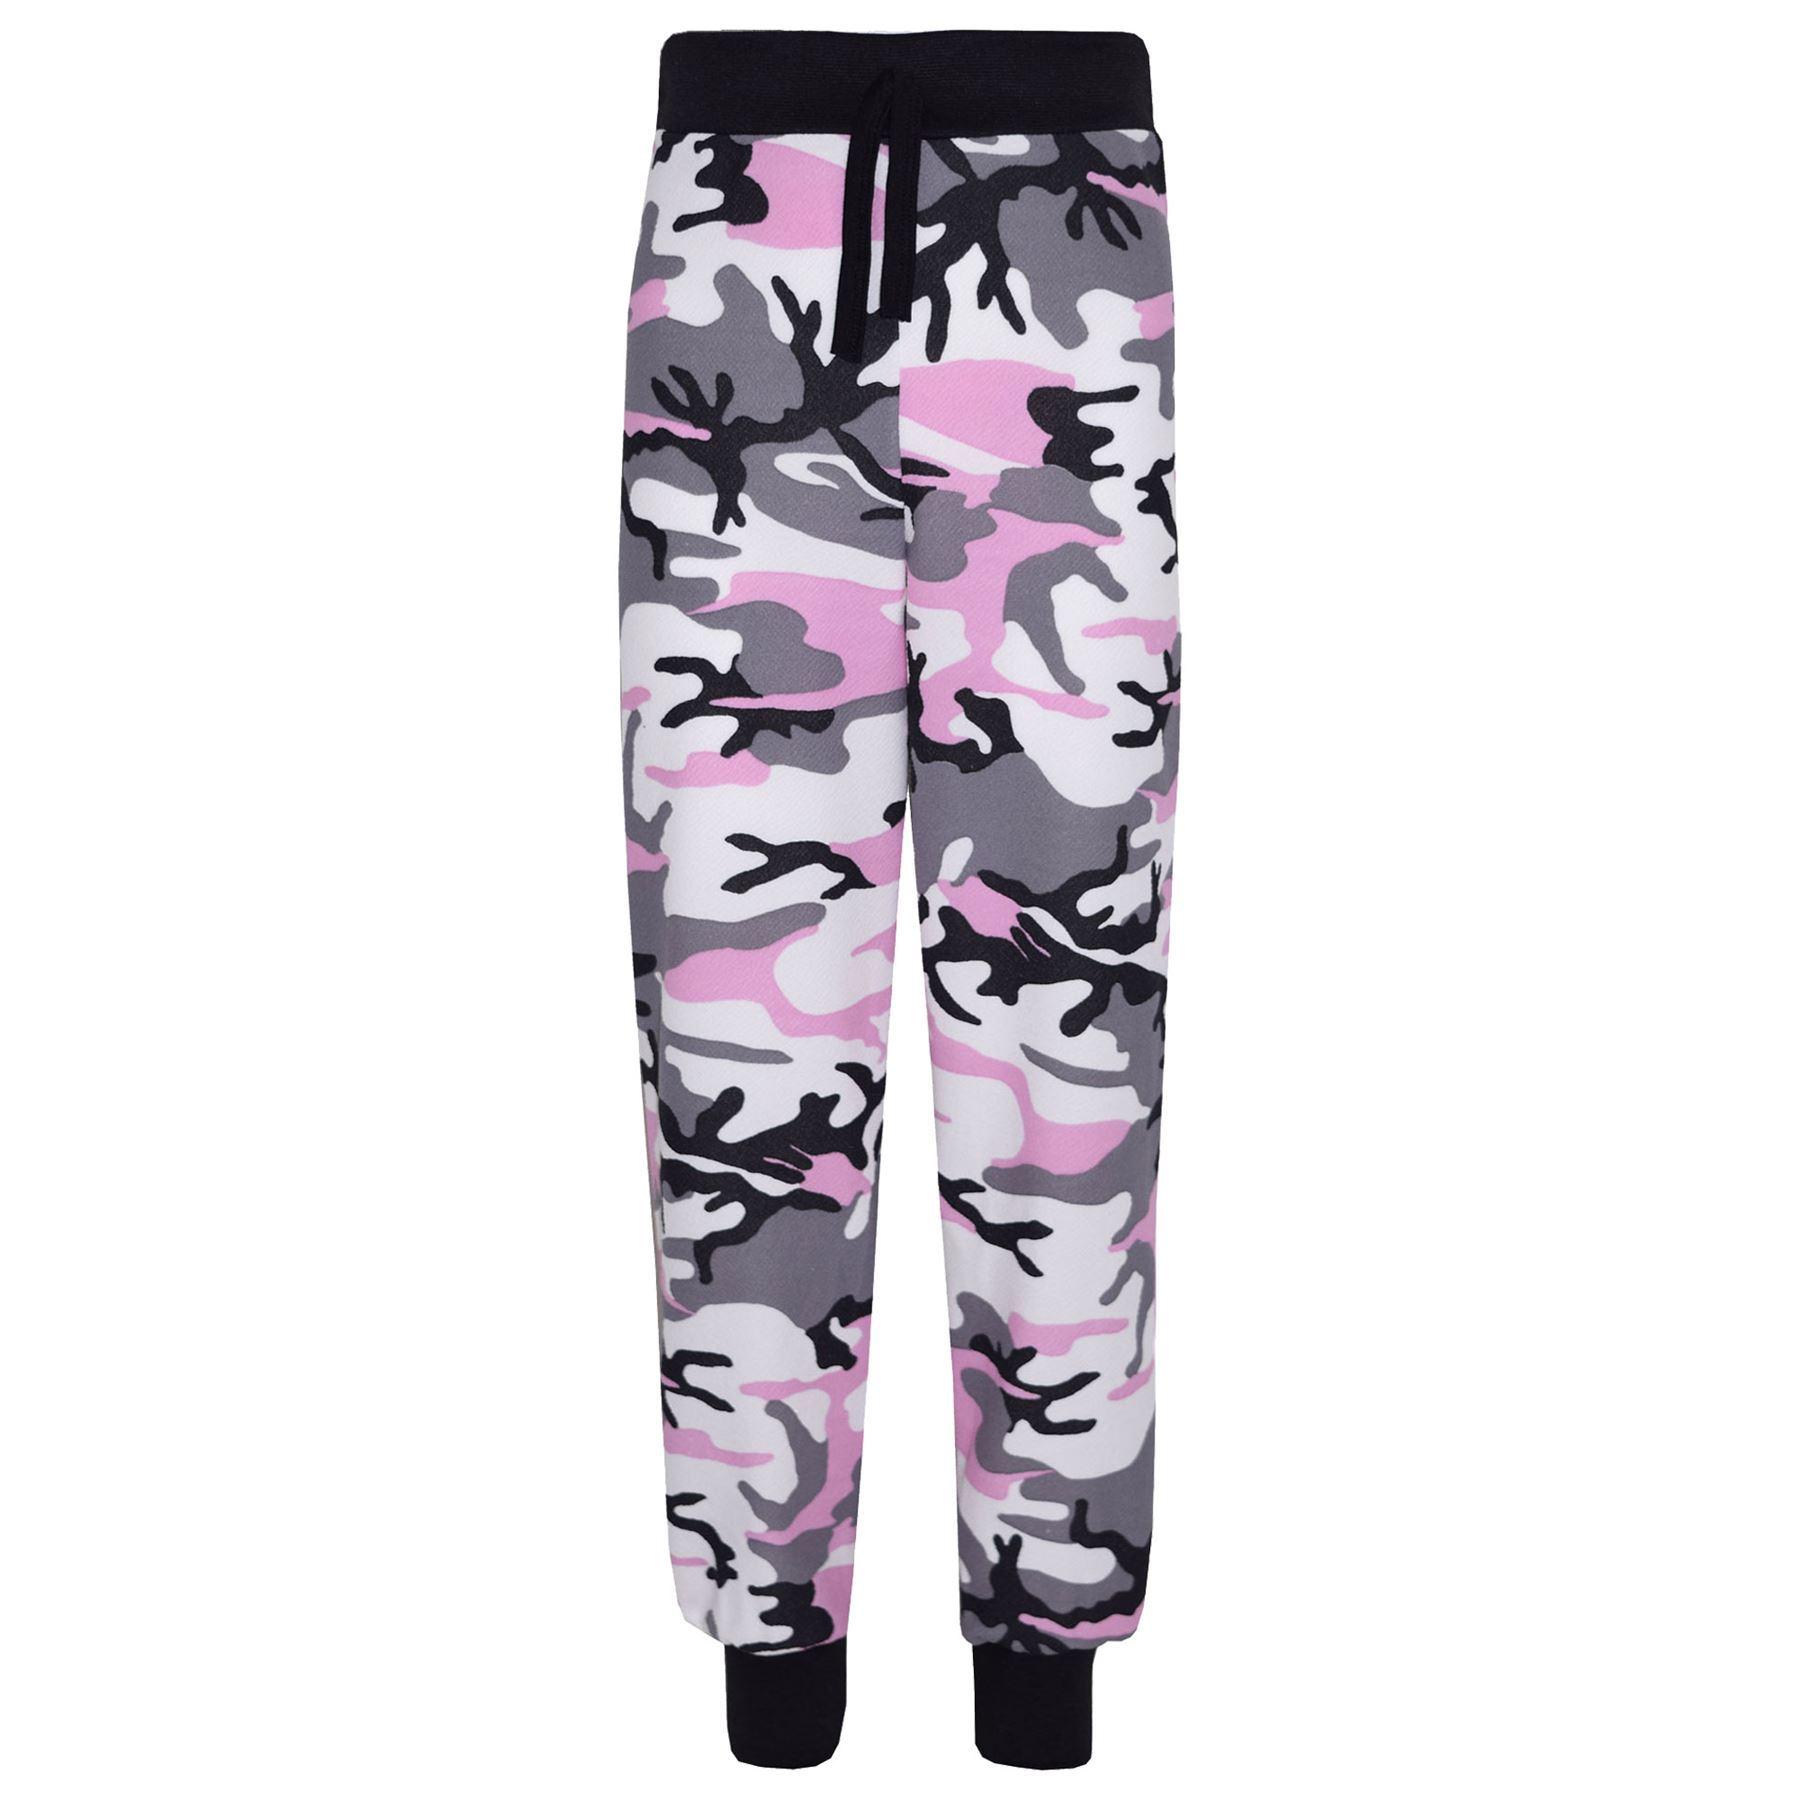 Girls-NEW-YORK-BROOKLYN-98-ATHLECTIC-Camouflage-Print-Top-amp-Legging-Set-7-13-Yr thumbnail 9